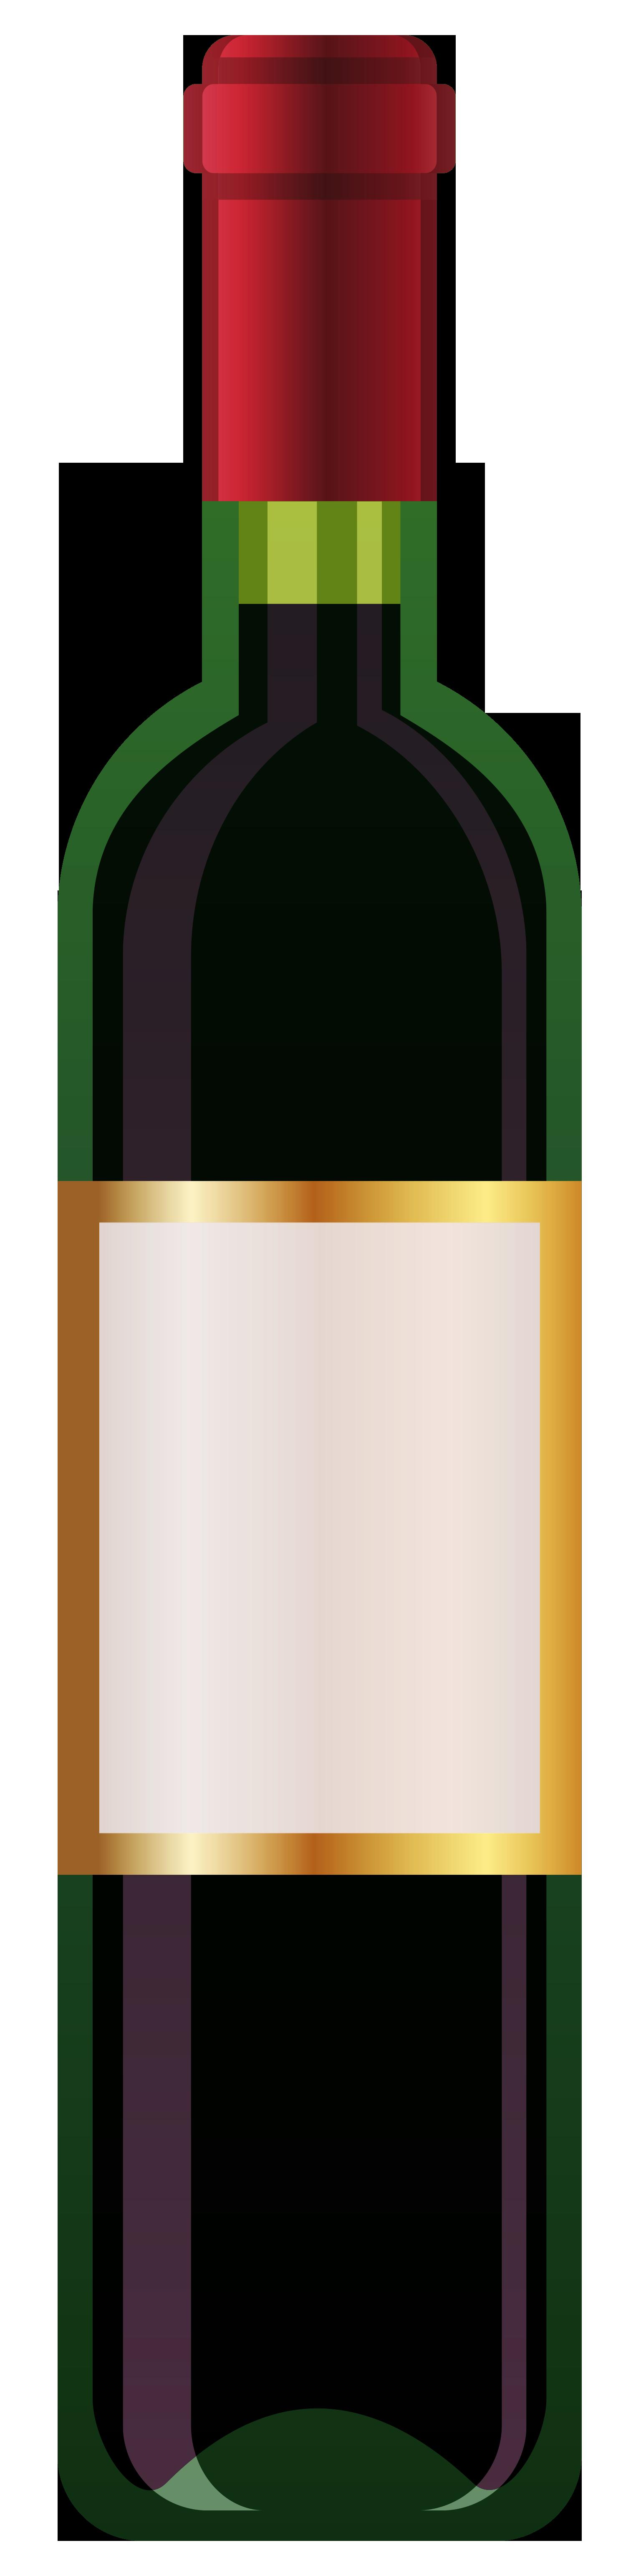 picture transparent stock Wine clipart jokingart com. Vector bottle clip art